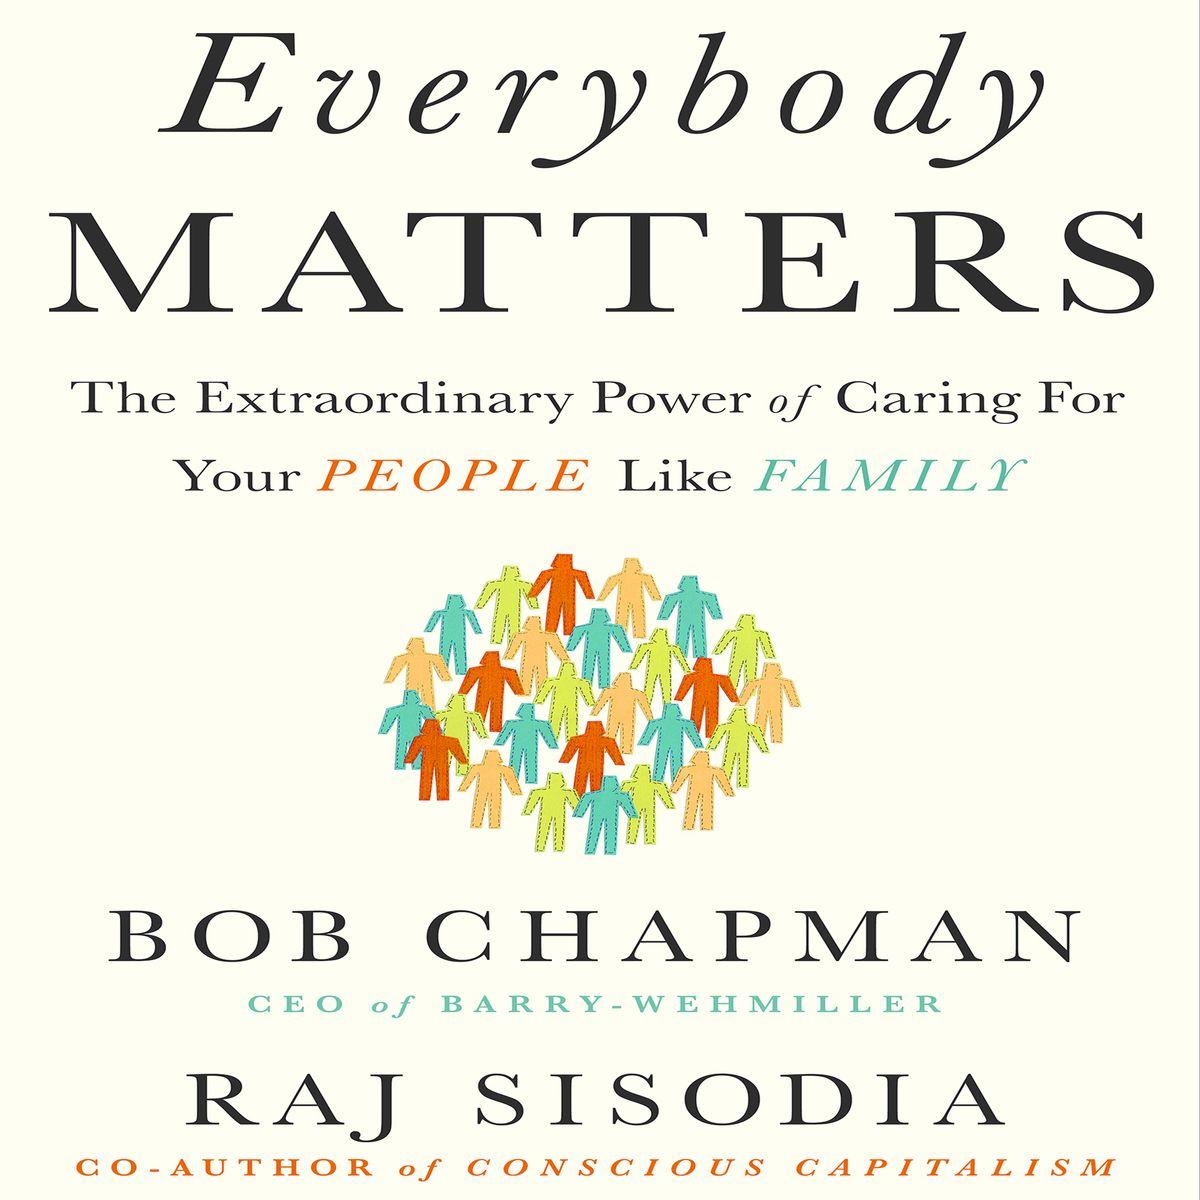 Bob Chapman and Raj Sisodia in Conversation